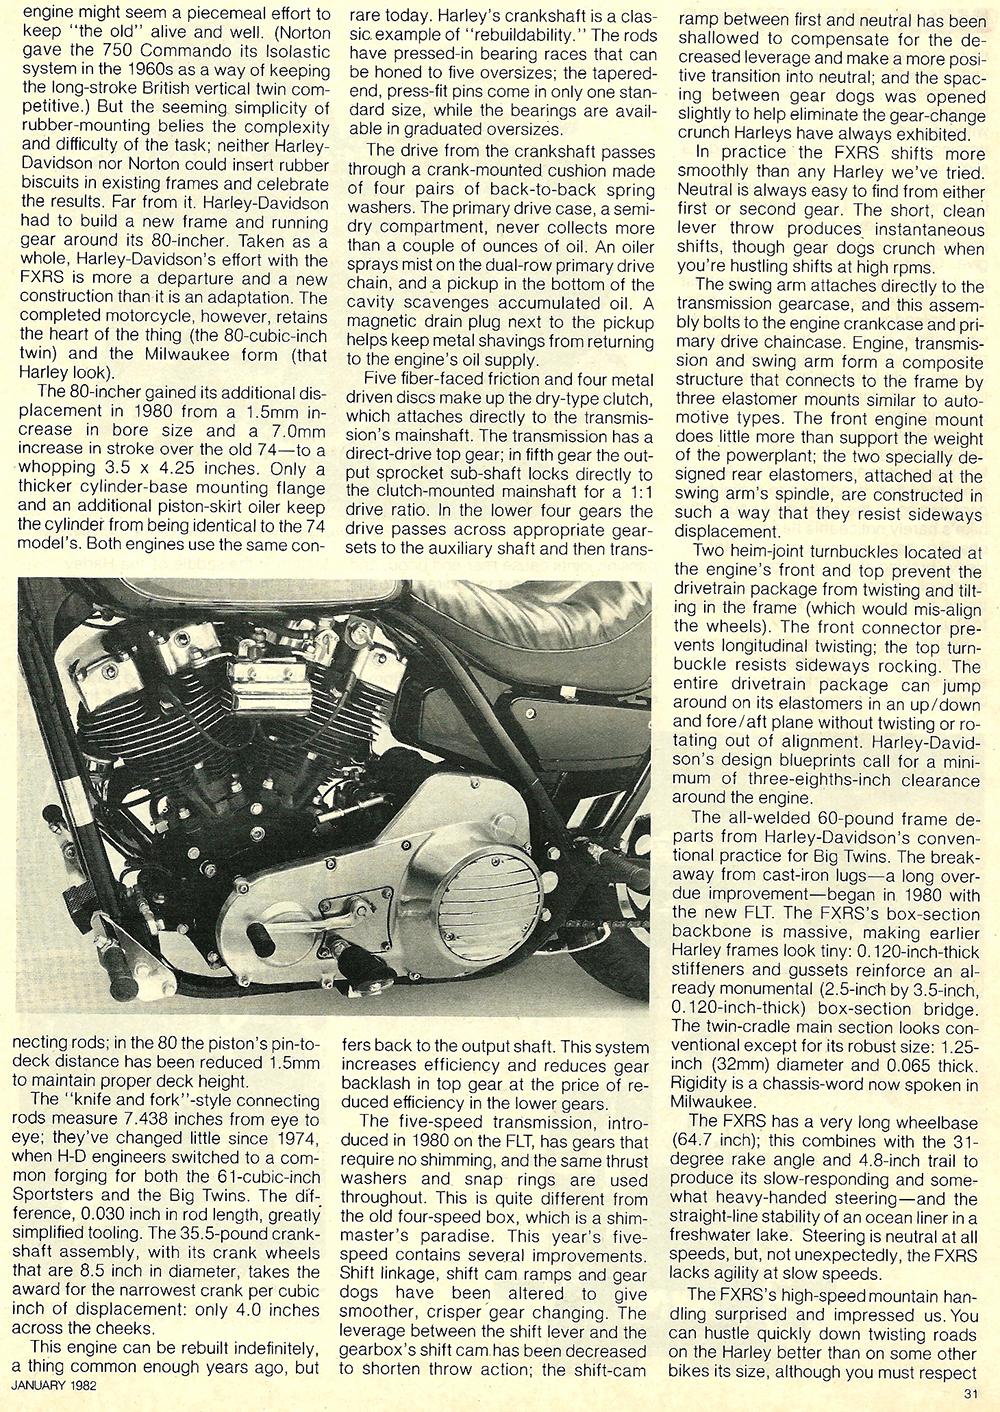 1982 Harley-Davidson FXRS road test 04.jpg